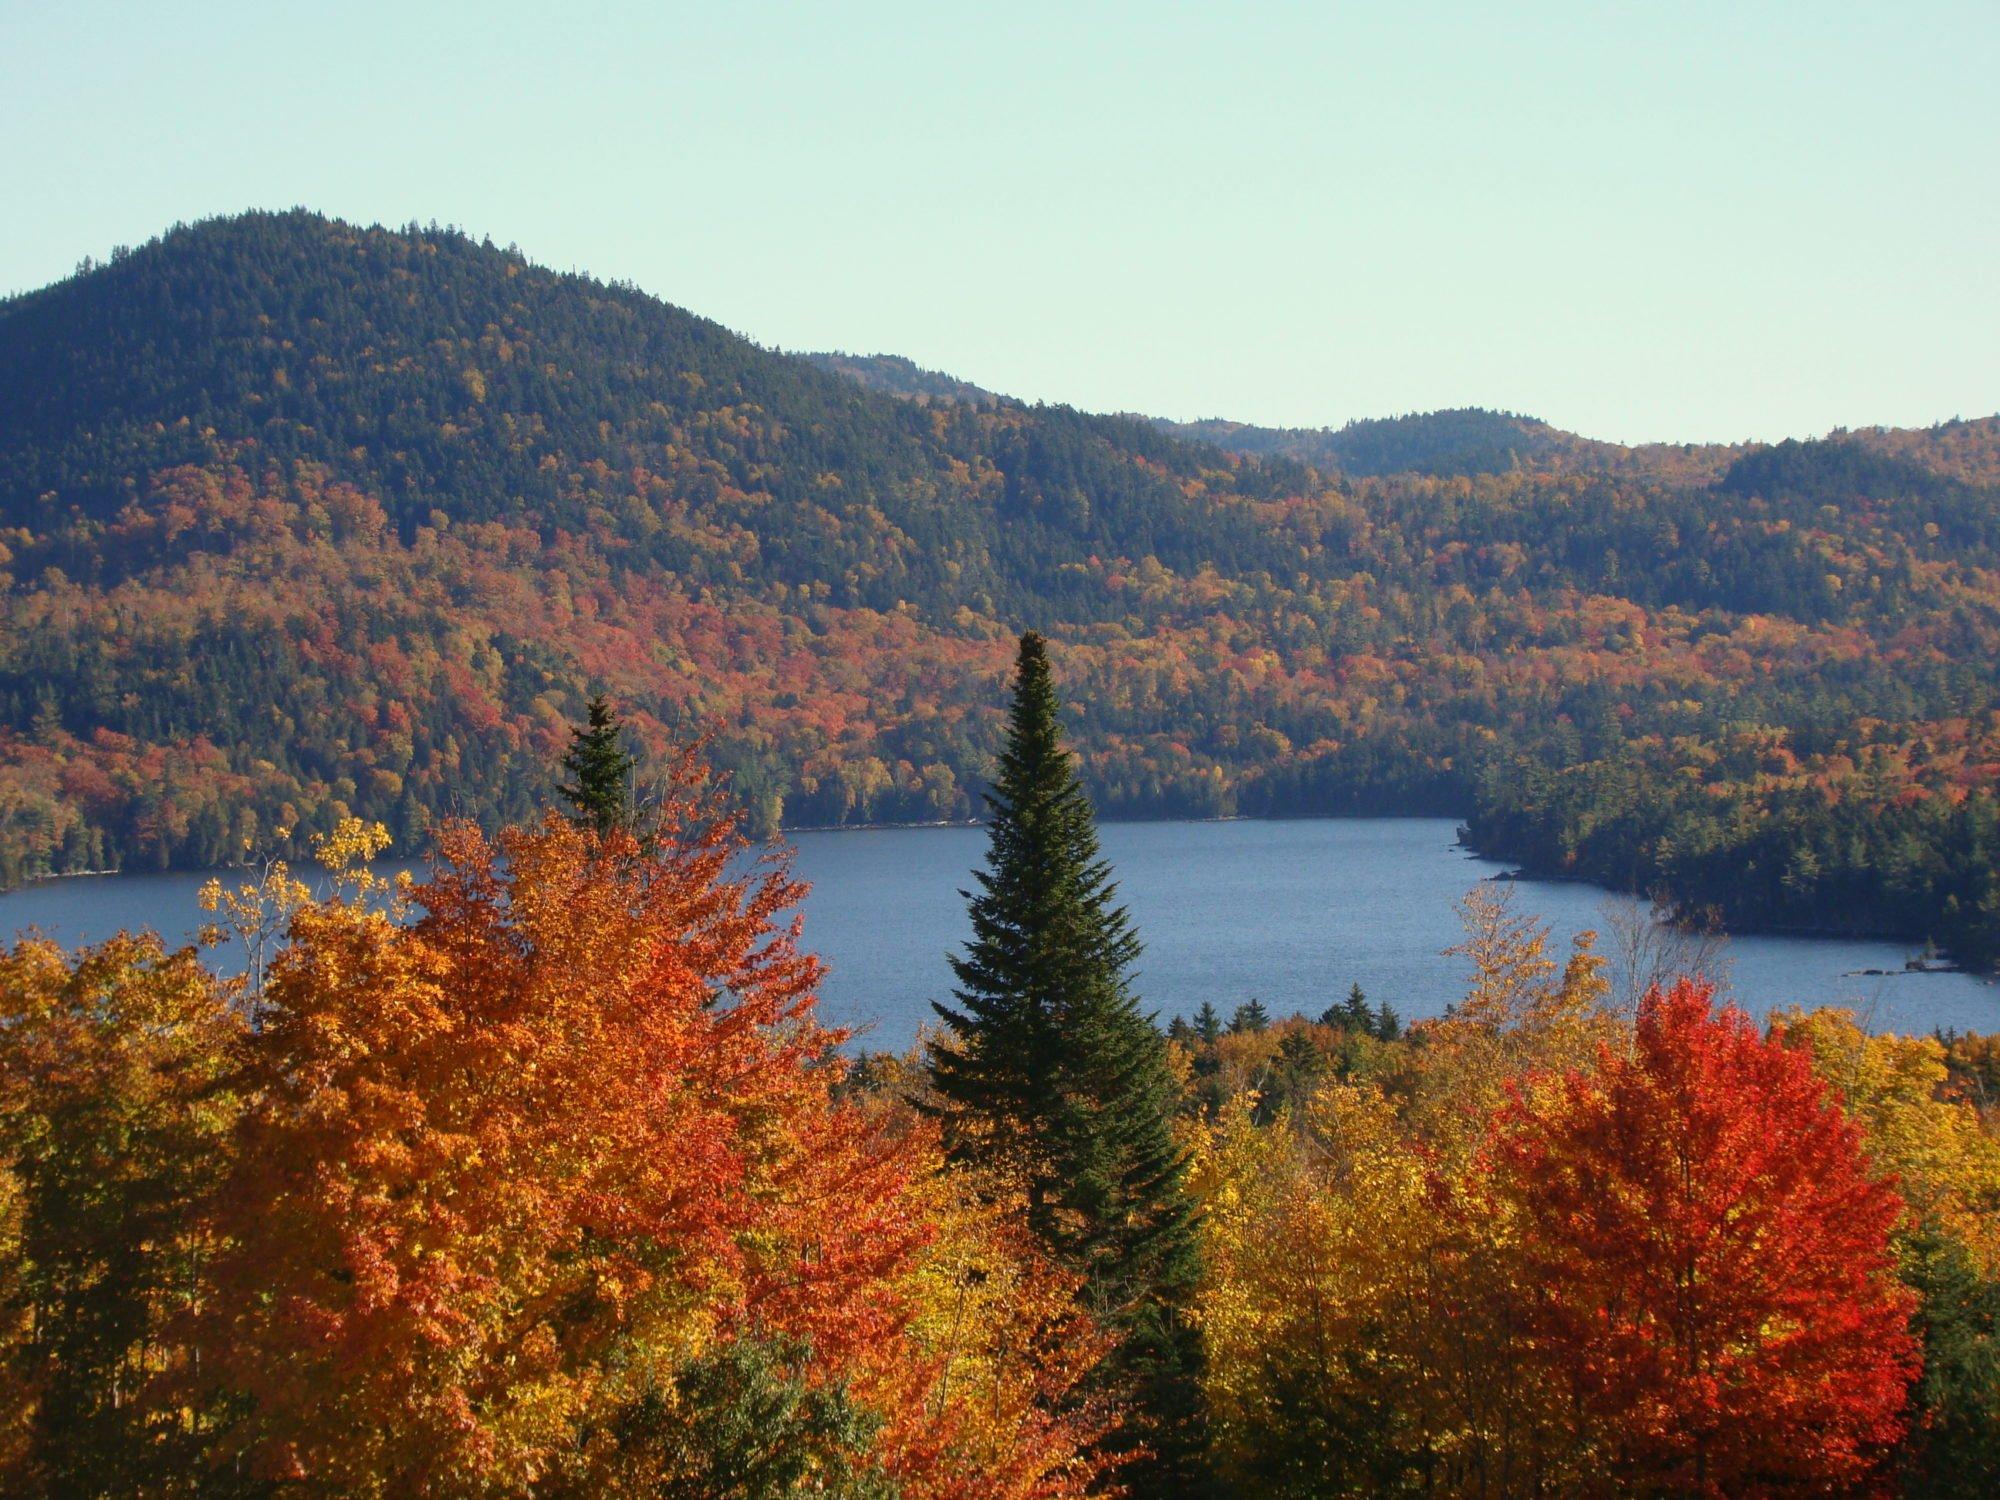 Moosehead Hills Cabins Rustic Luxury Log Cabin Rentals On Moosehead Lake Maine